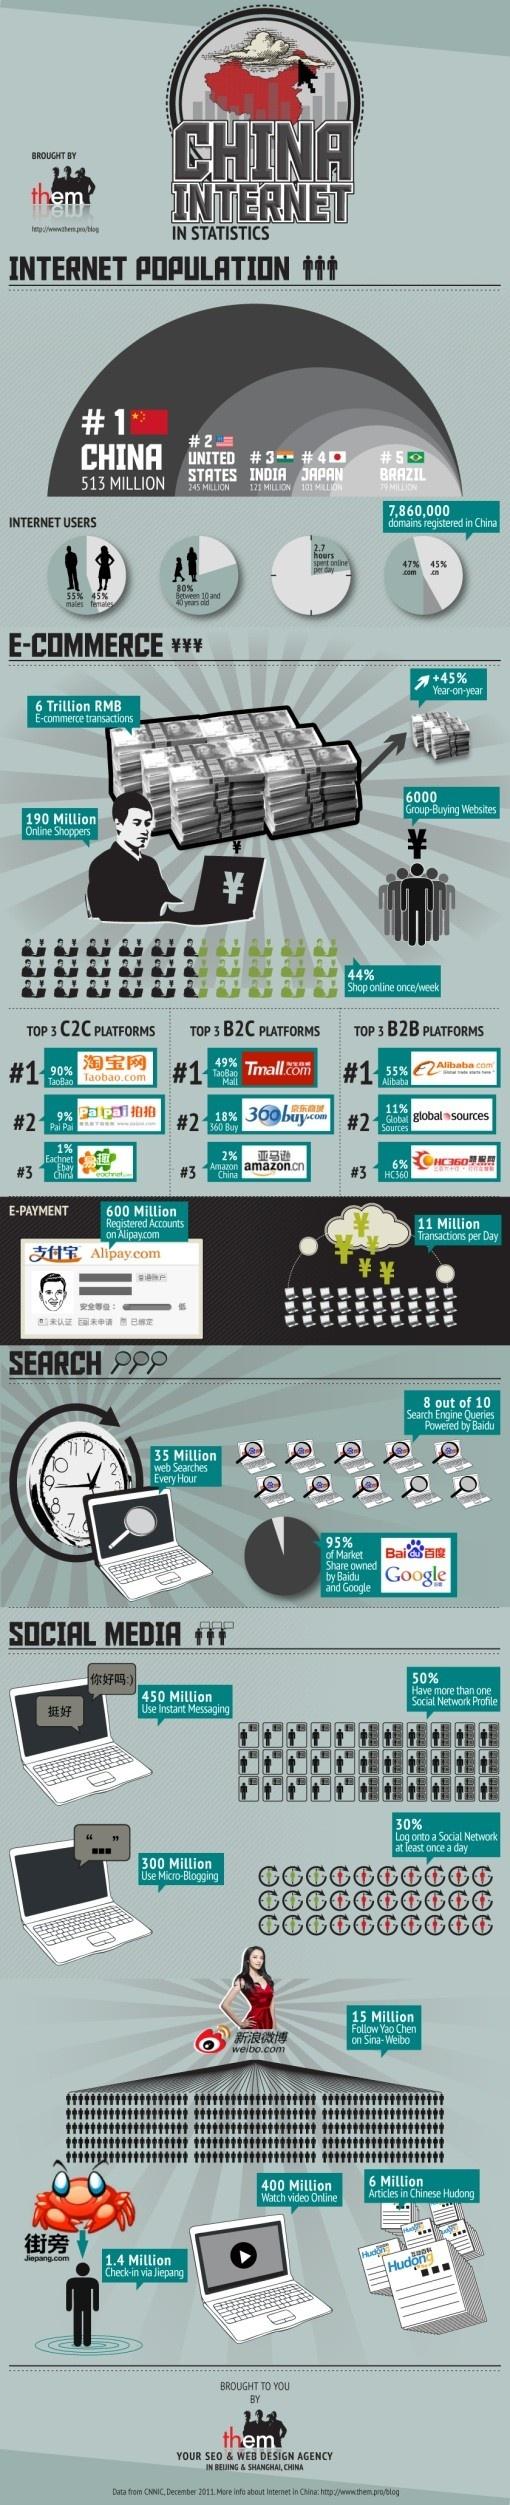 China Internet statistics